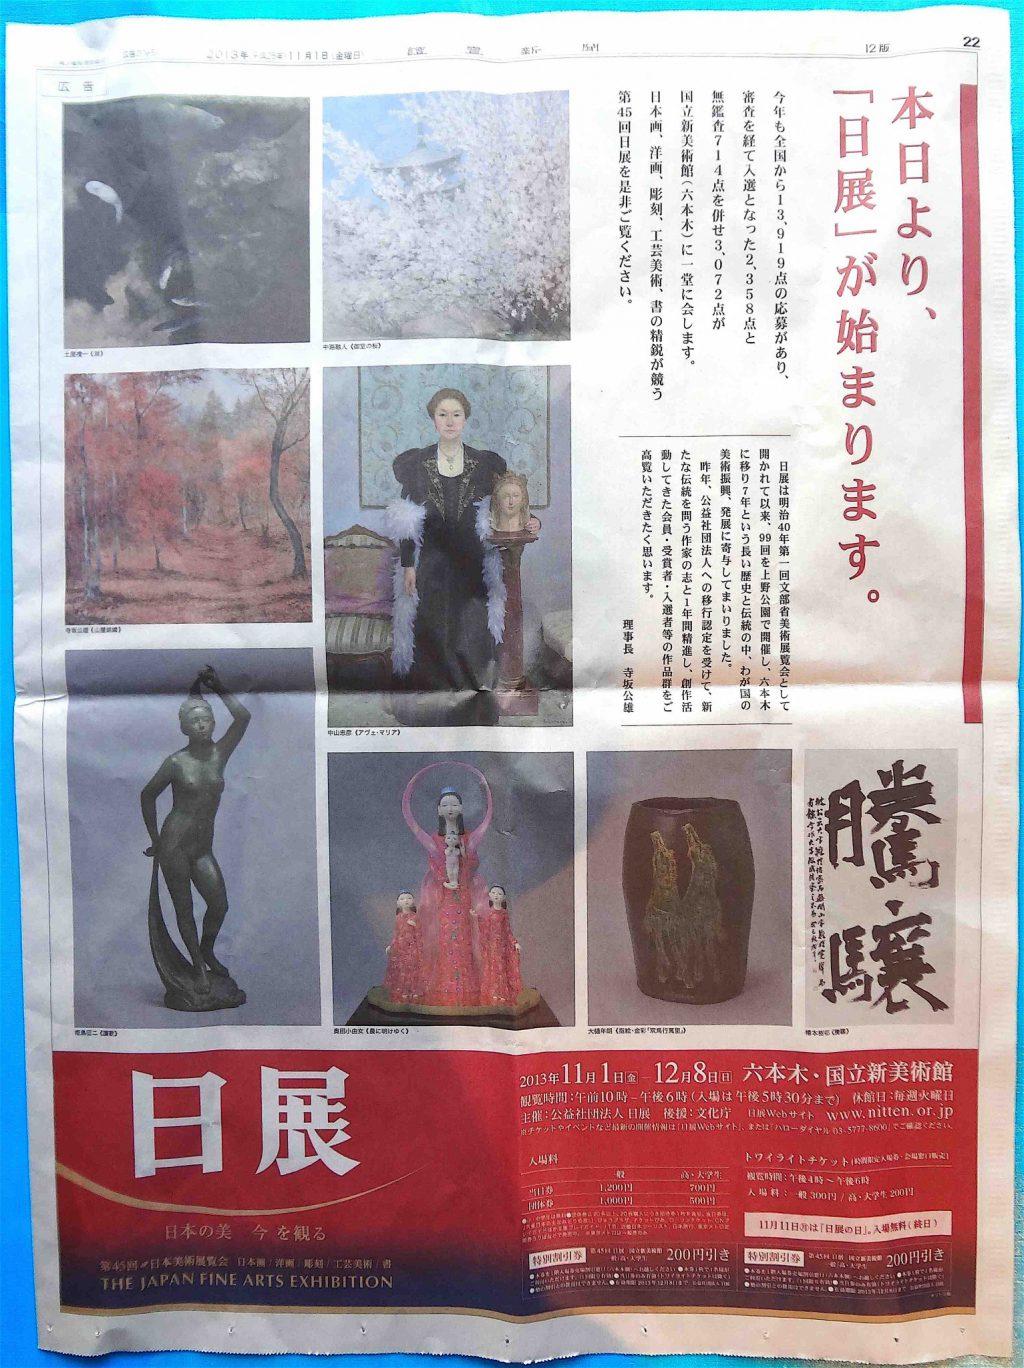 2013年11月1日の読売新聞、第45回 日本美術展覧会 (日展)の広告